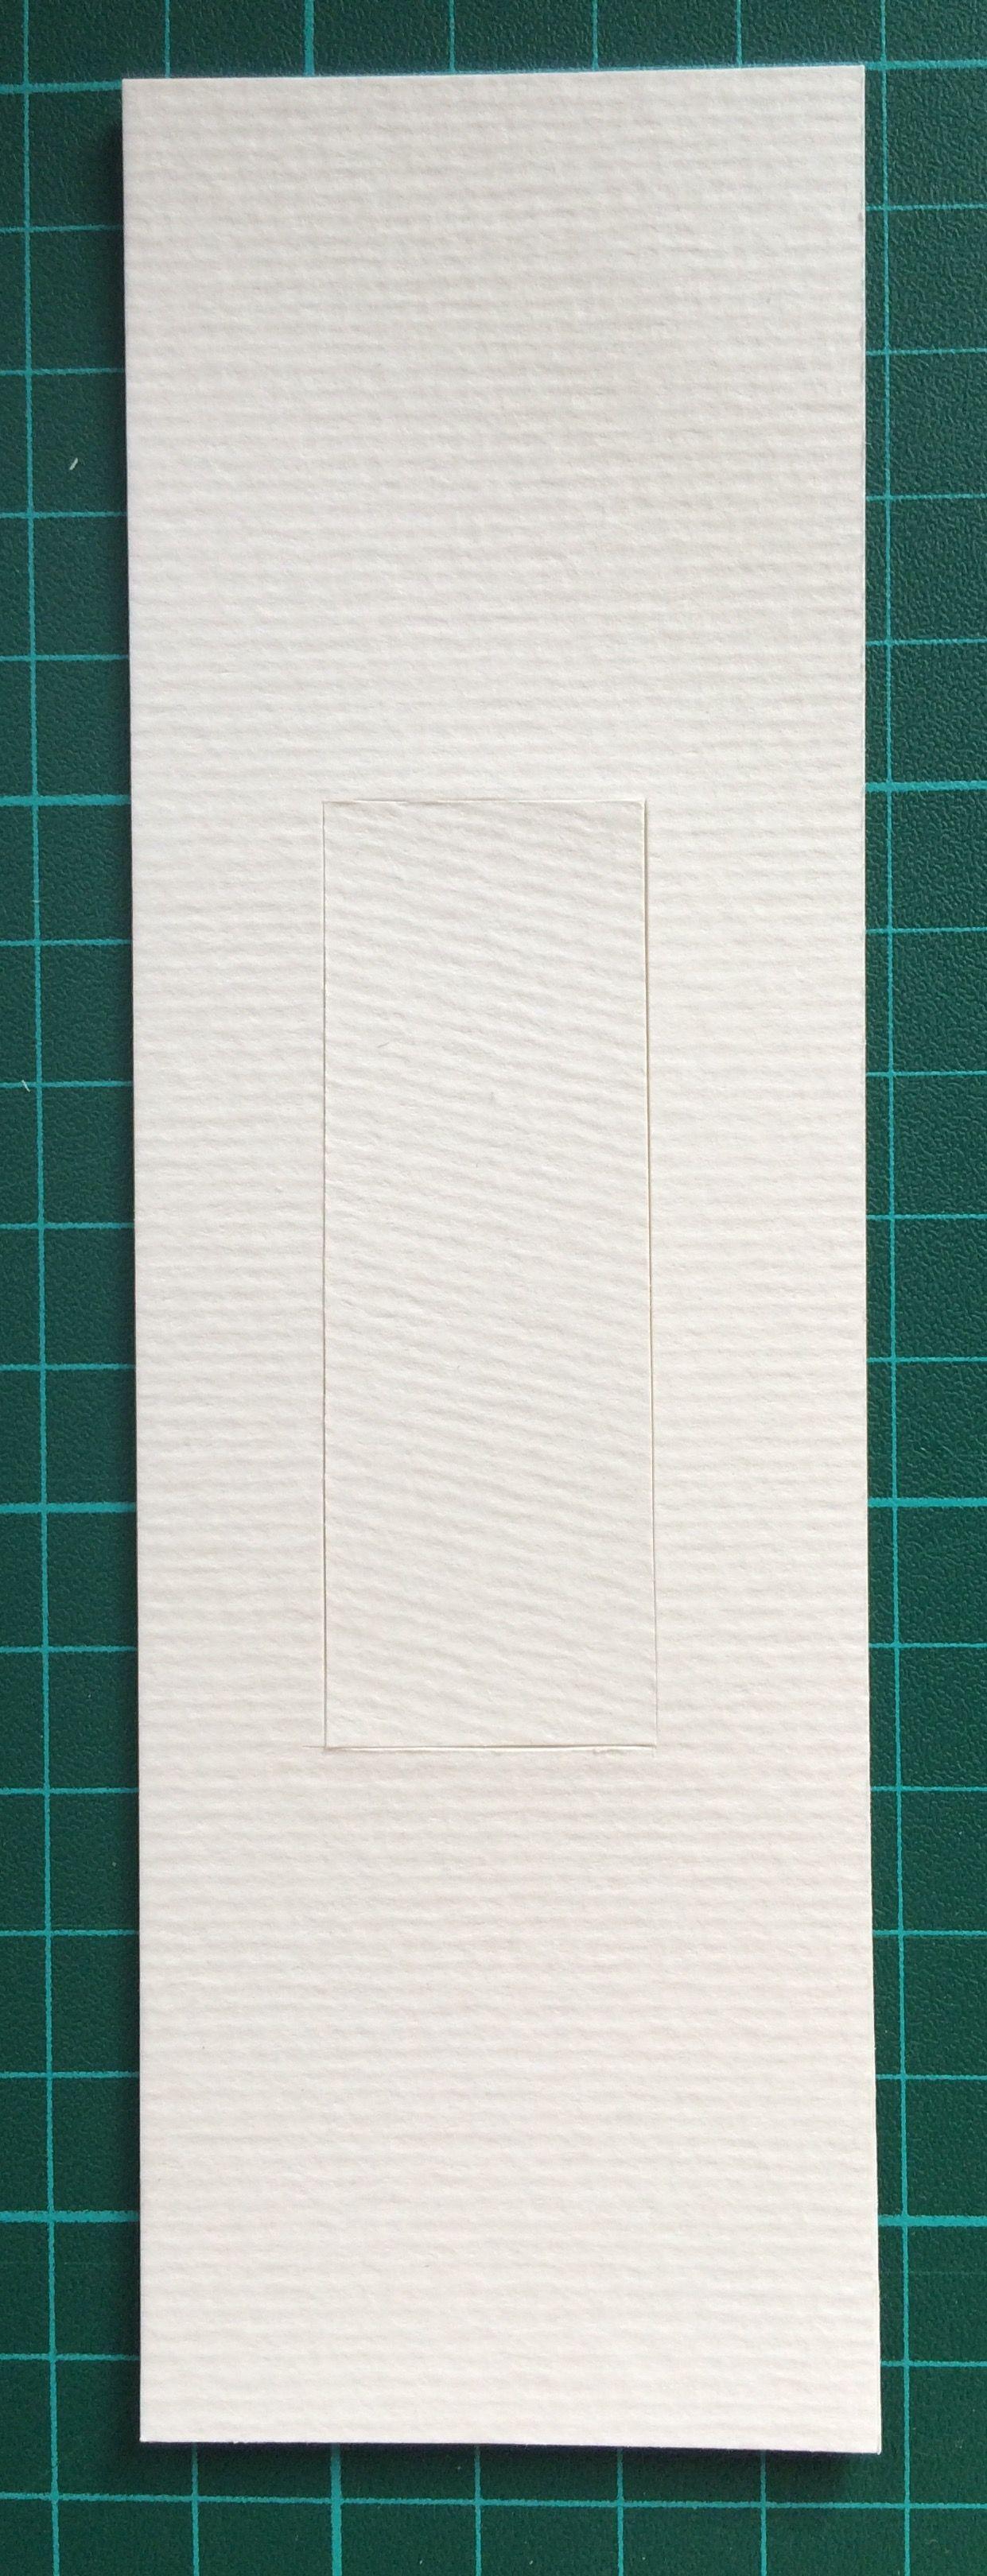 Trauma 2  paper, 5cm x 18cm, 2015.